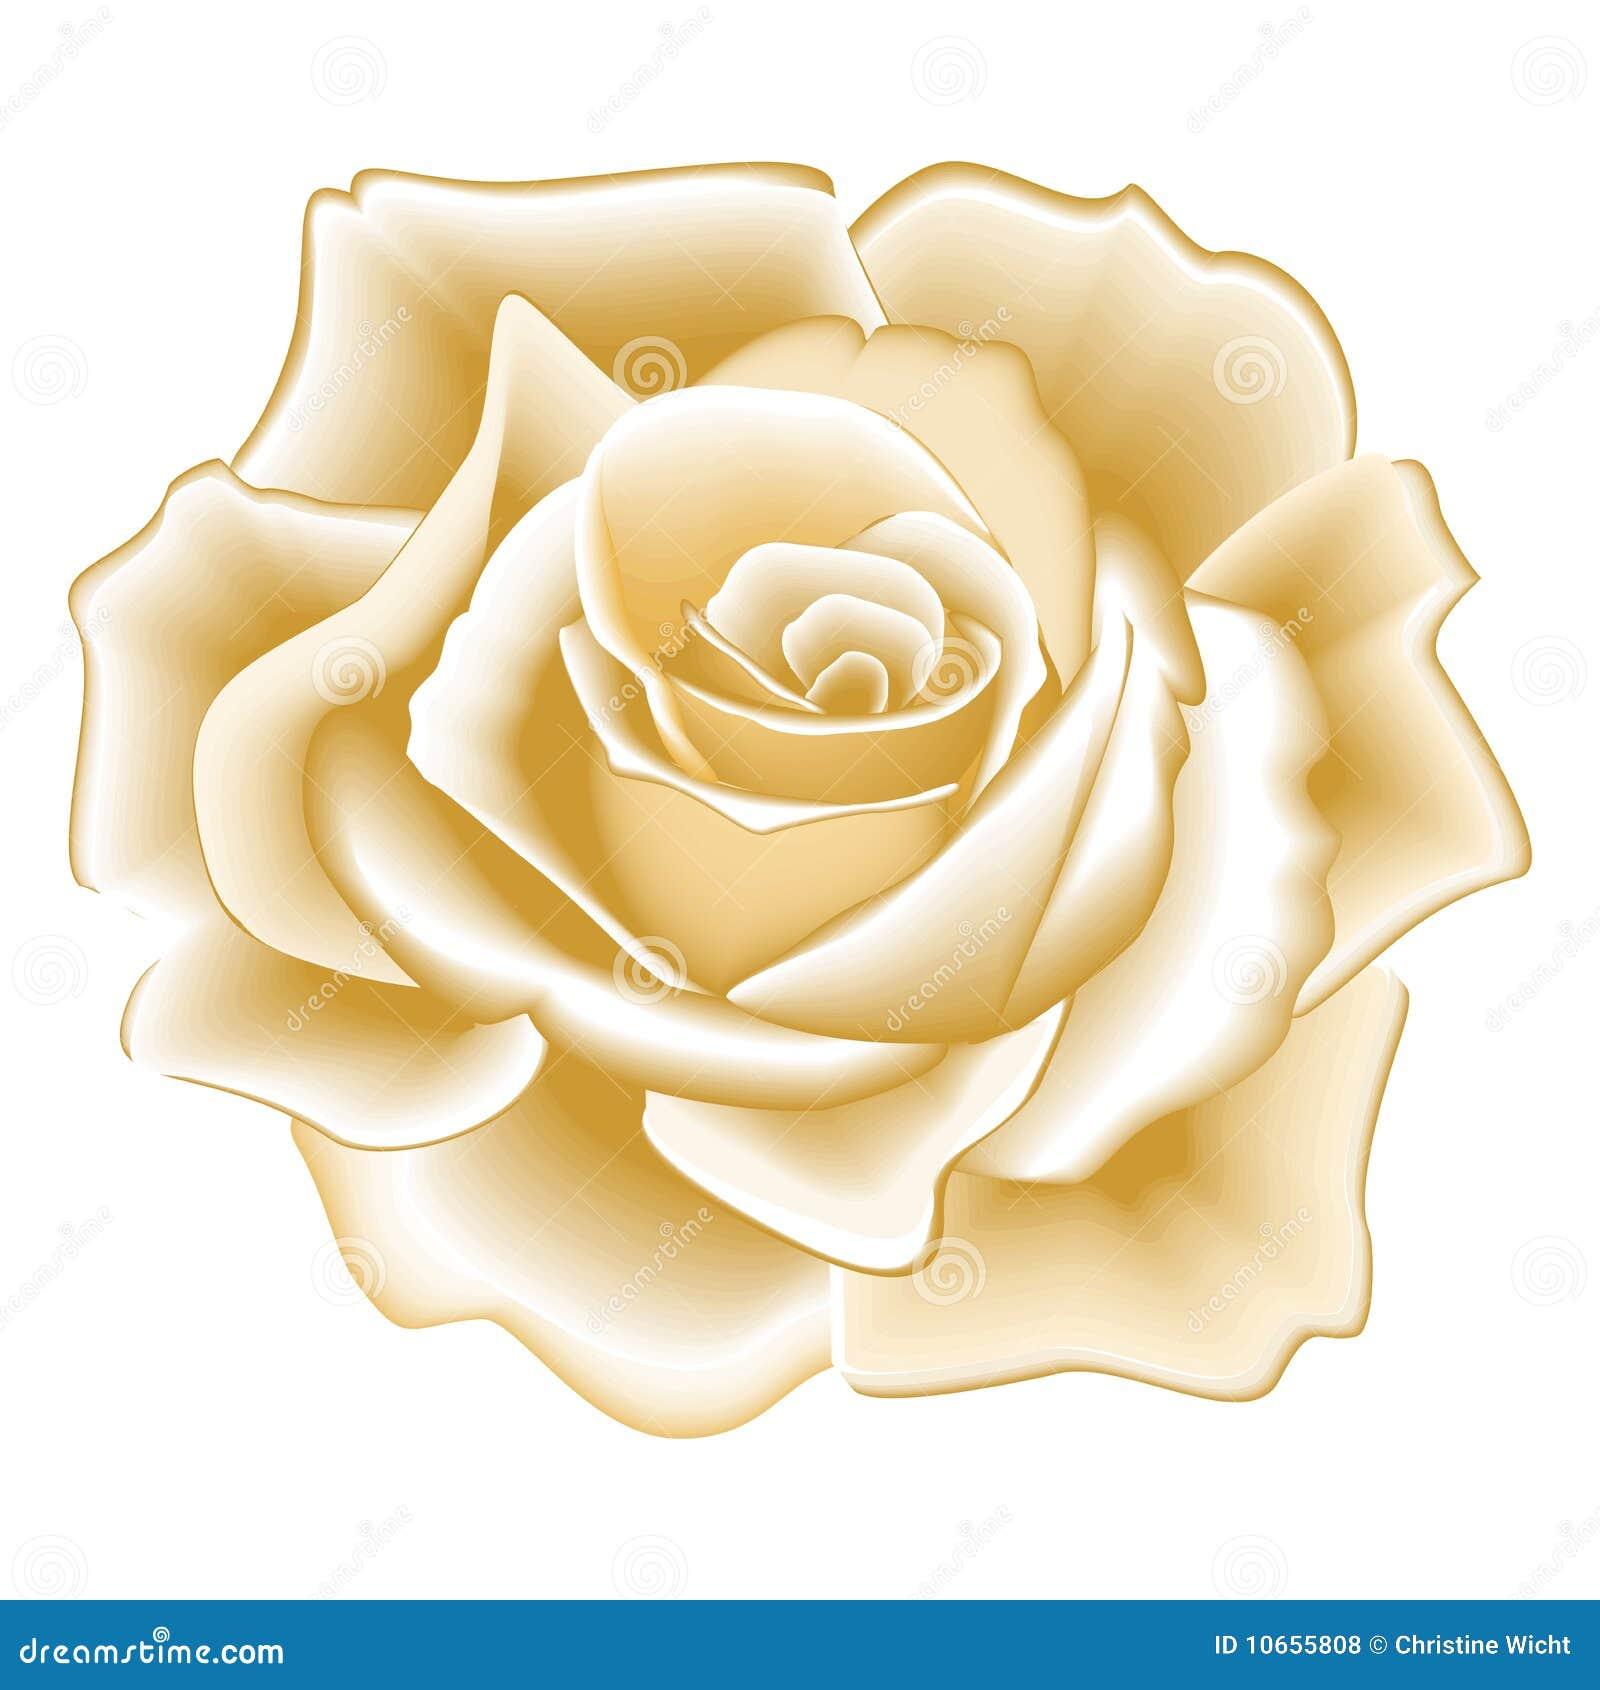 goldene rose lizenzfreie stockfotos bild 10655808. Black Bedroom Furniture Sets. Home Design Ideas